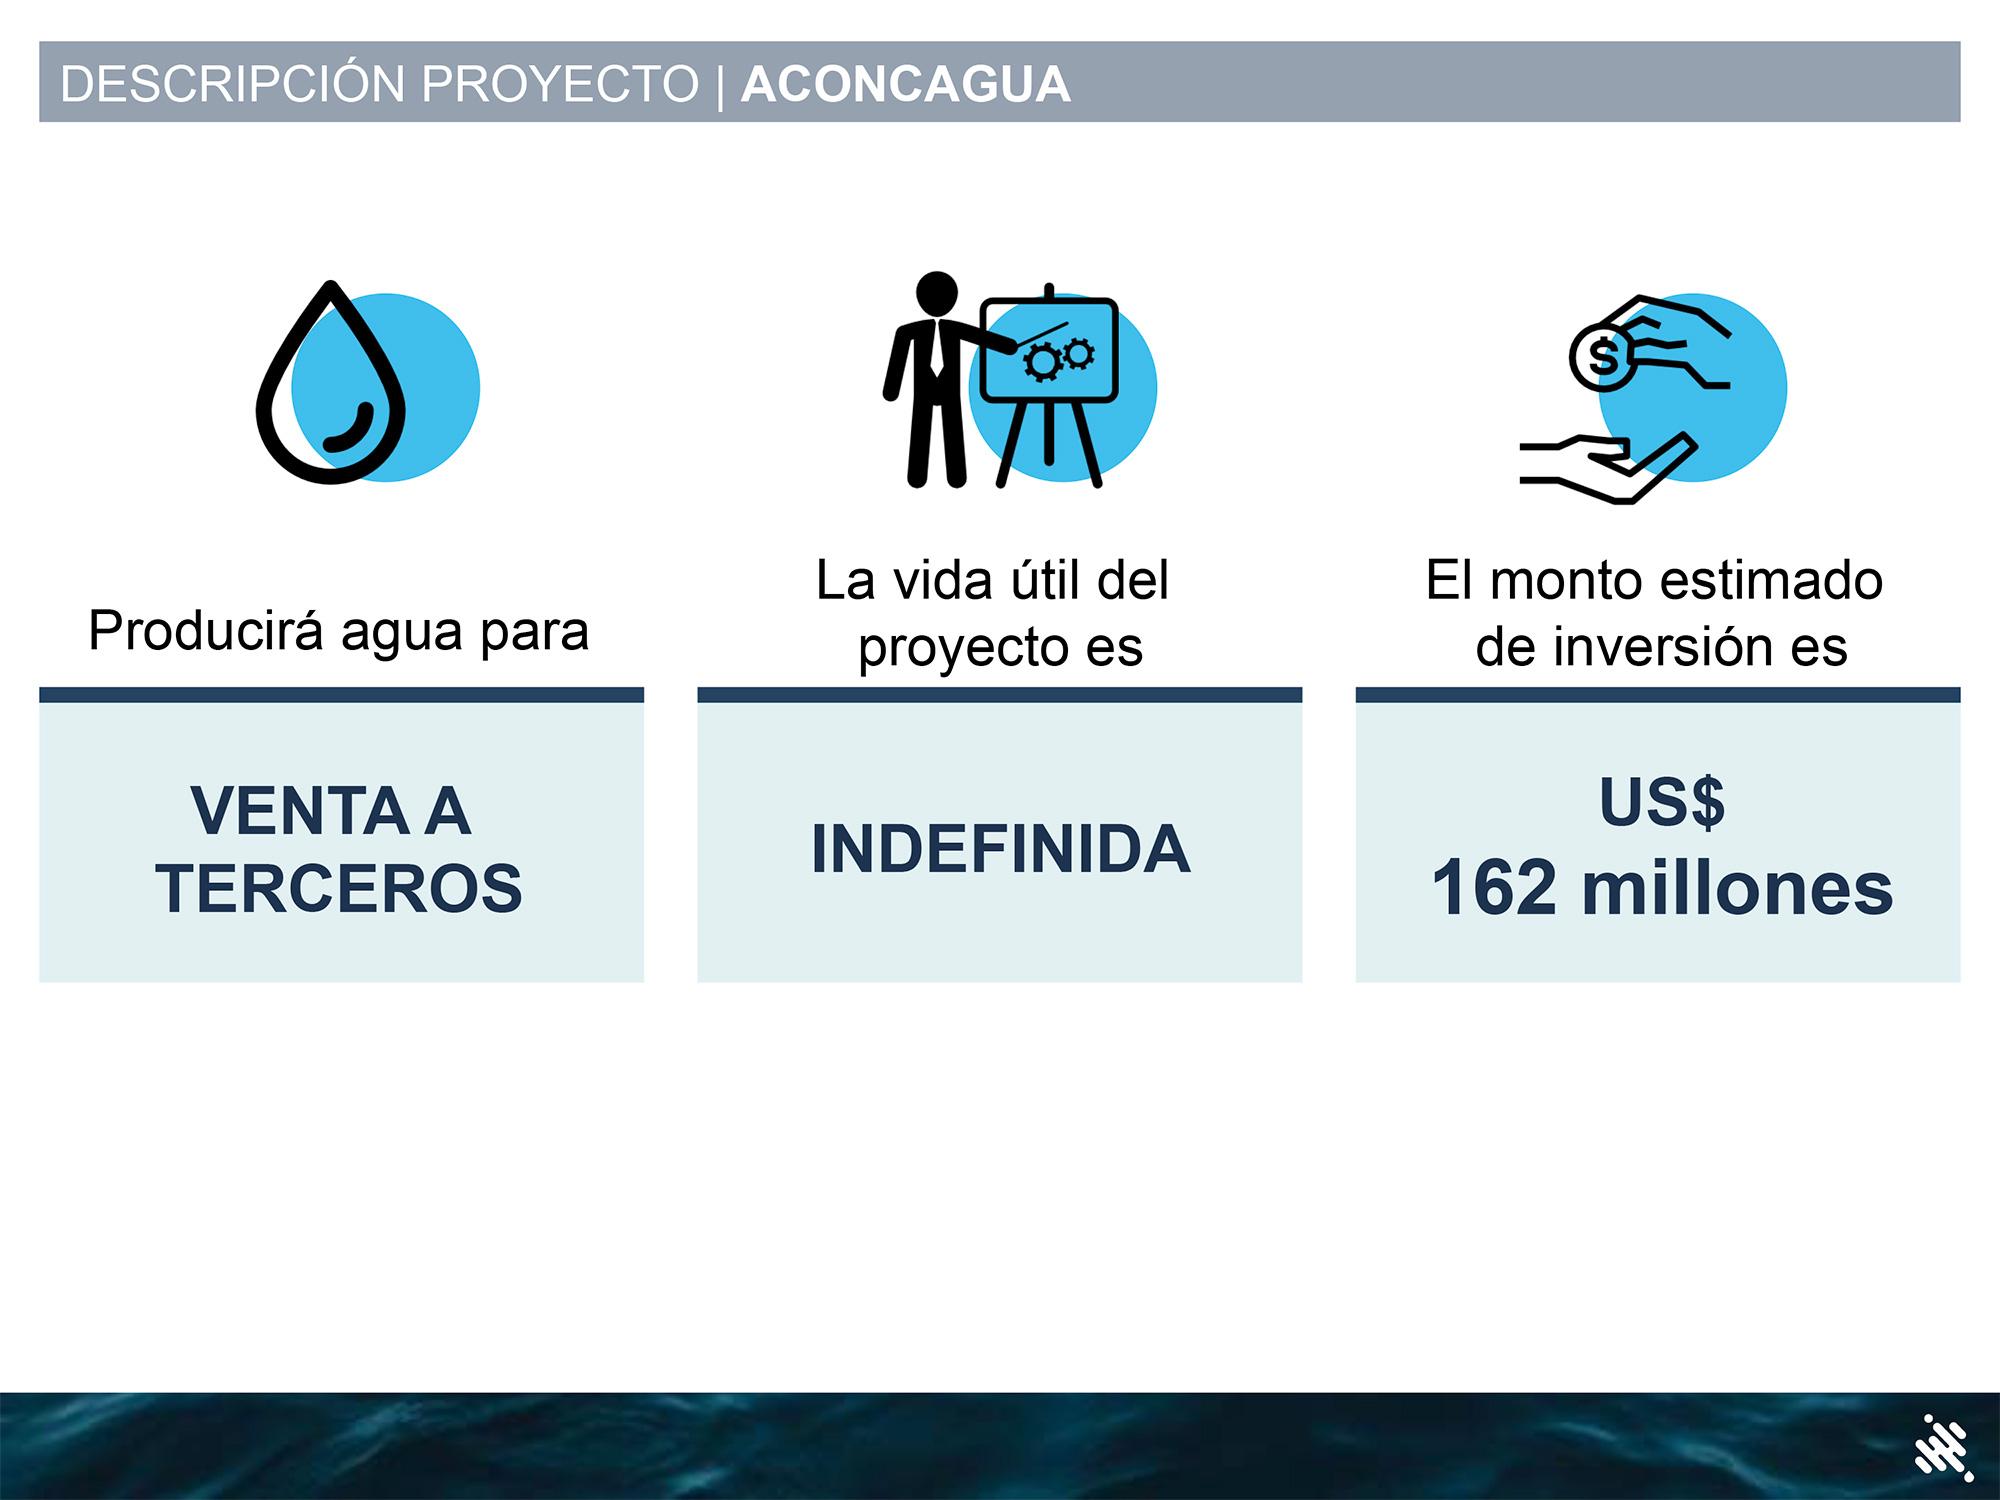 AP_Proyecto_Aconcagua-4.jpg